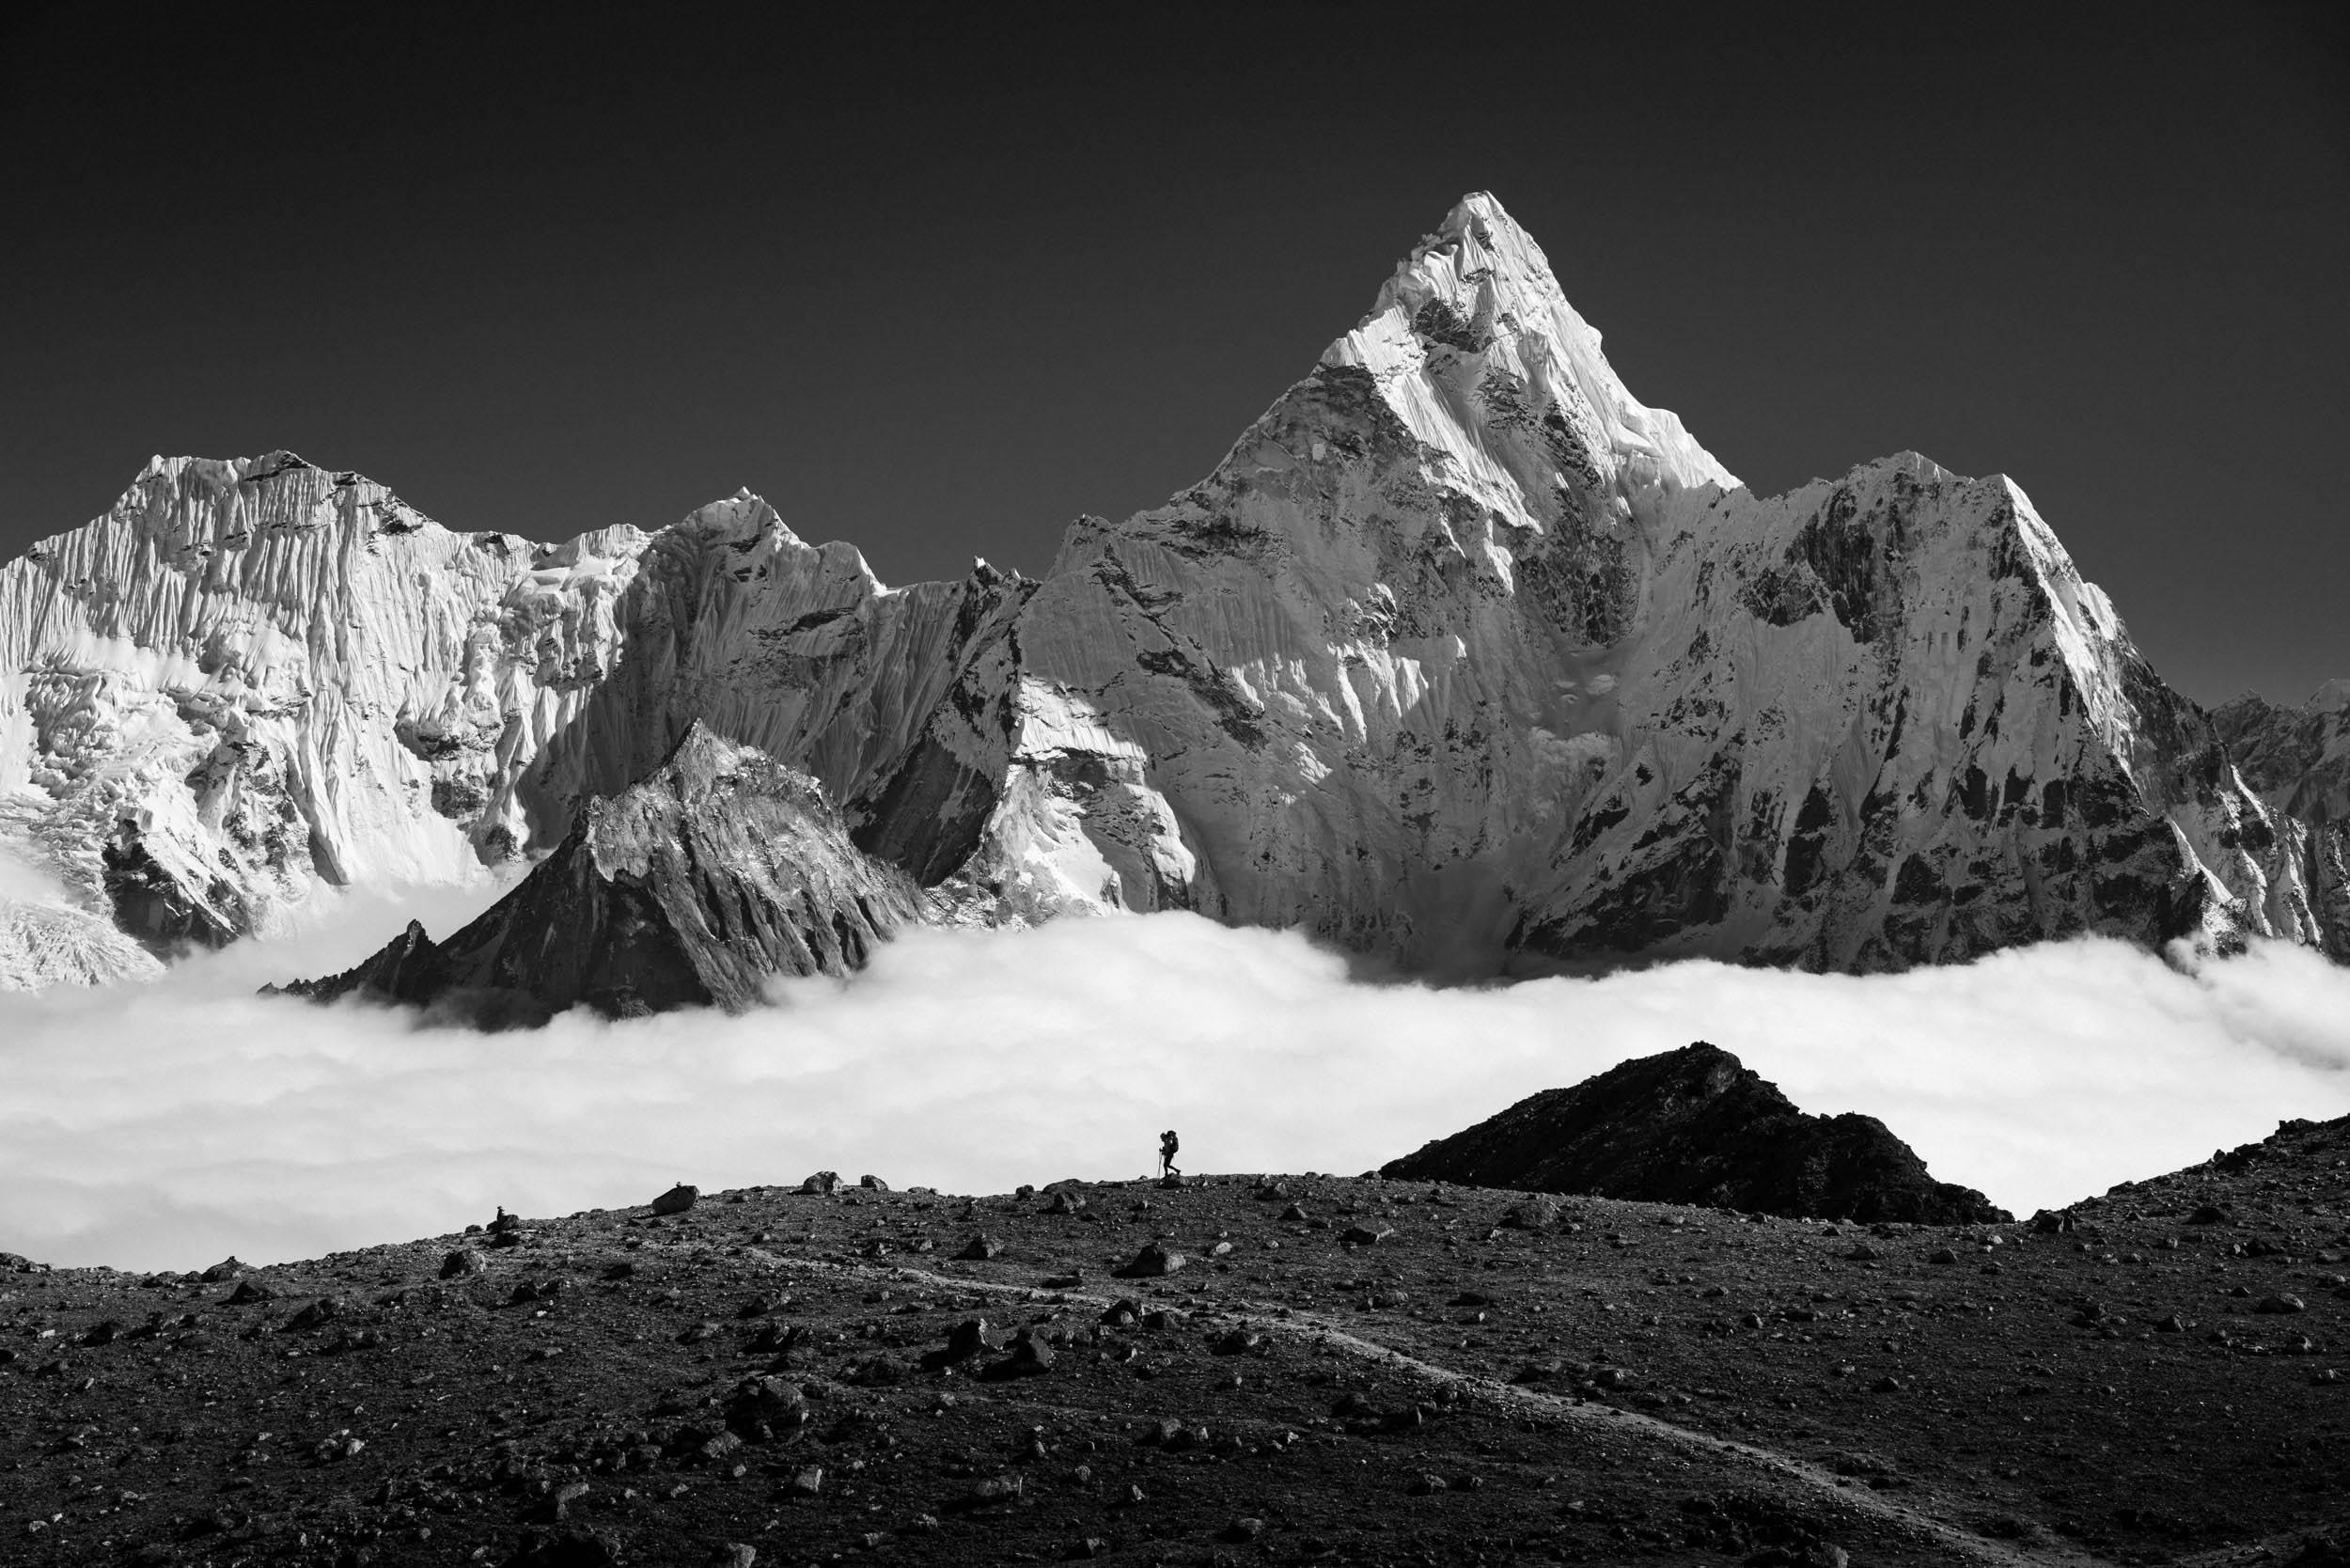 Mountain photography Roman Königshofer German Roamers Kongma La Pass Three Pass Trek Ama Dablam